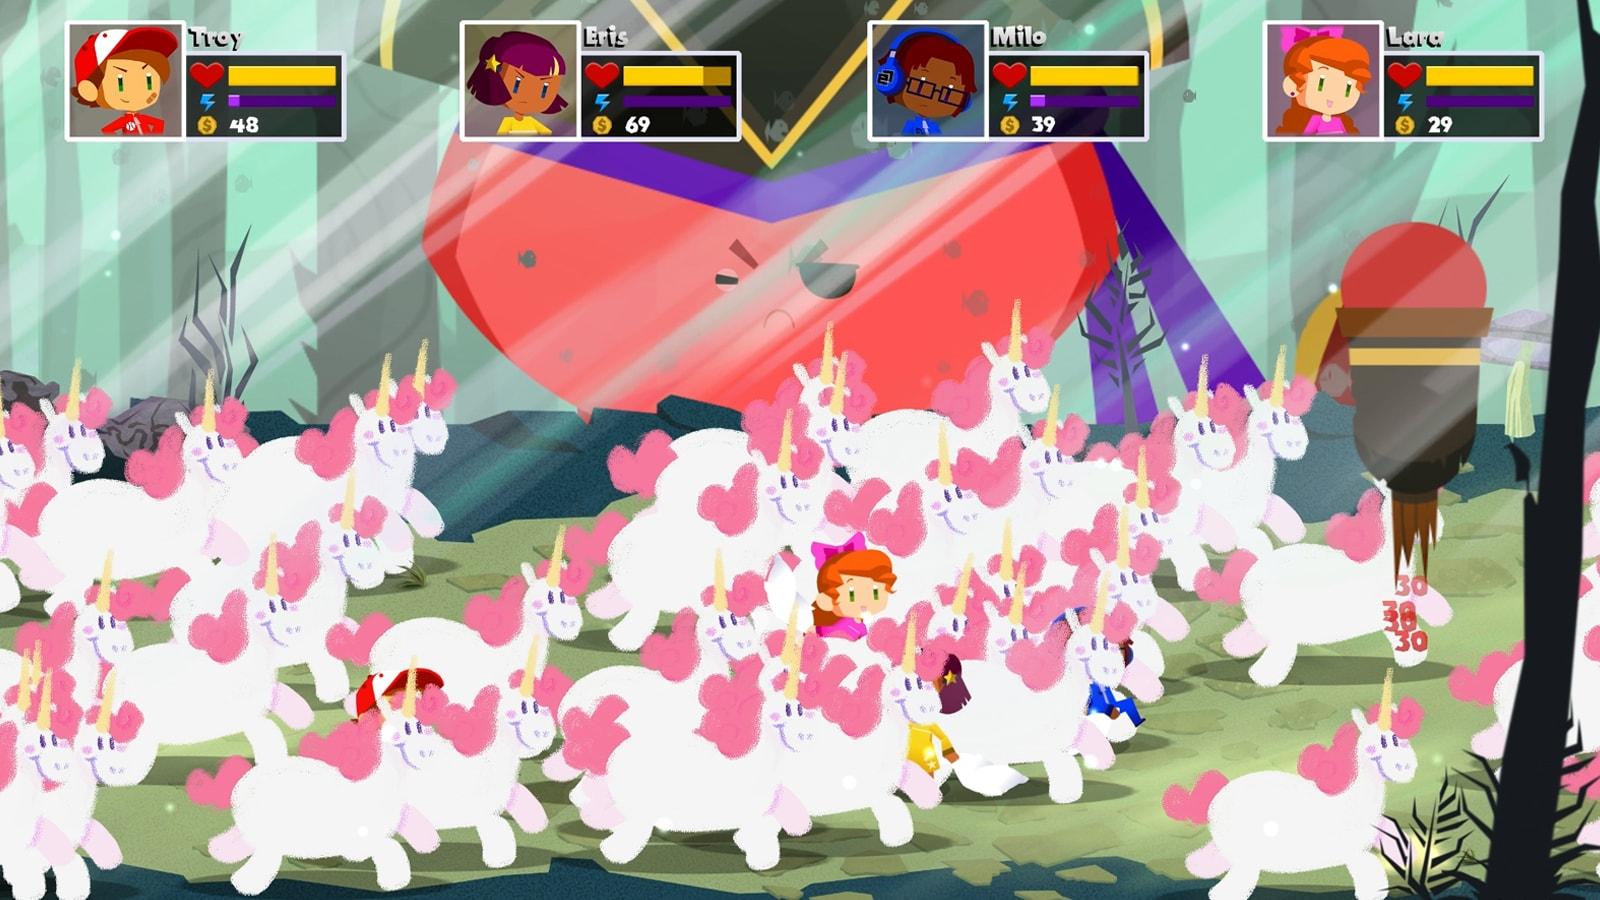 A herd of cute unicorns envelops Book of Dreams' main characters.